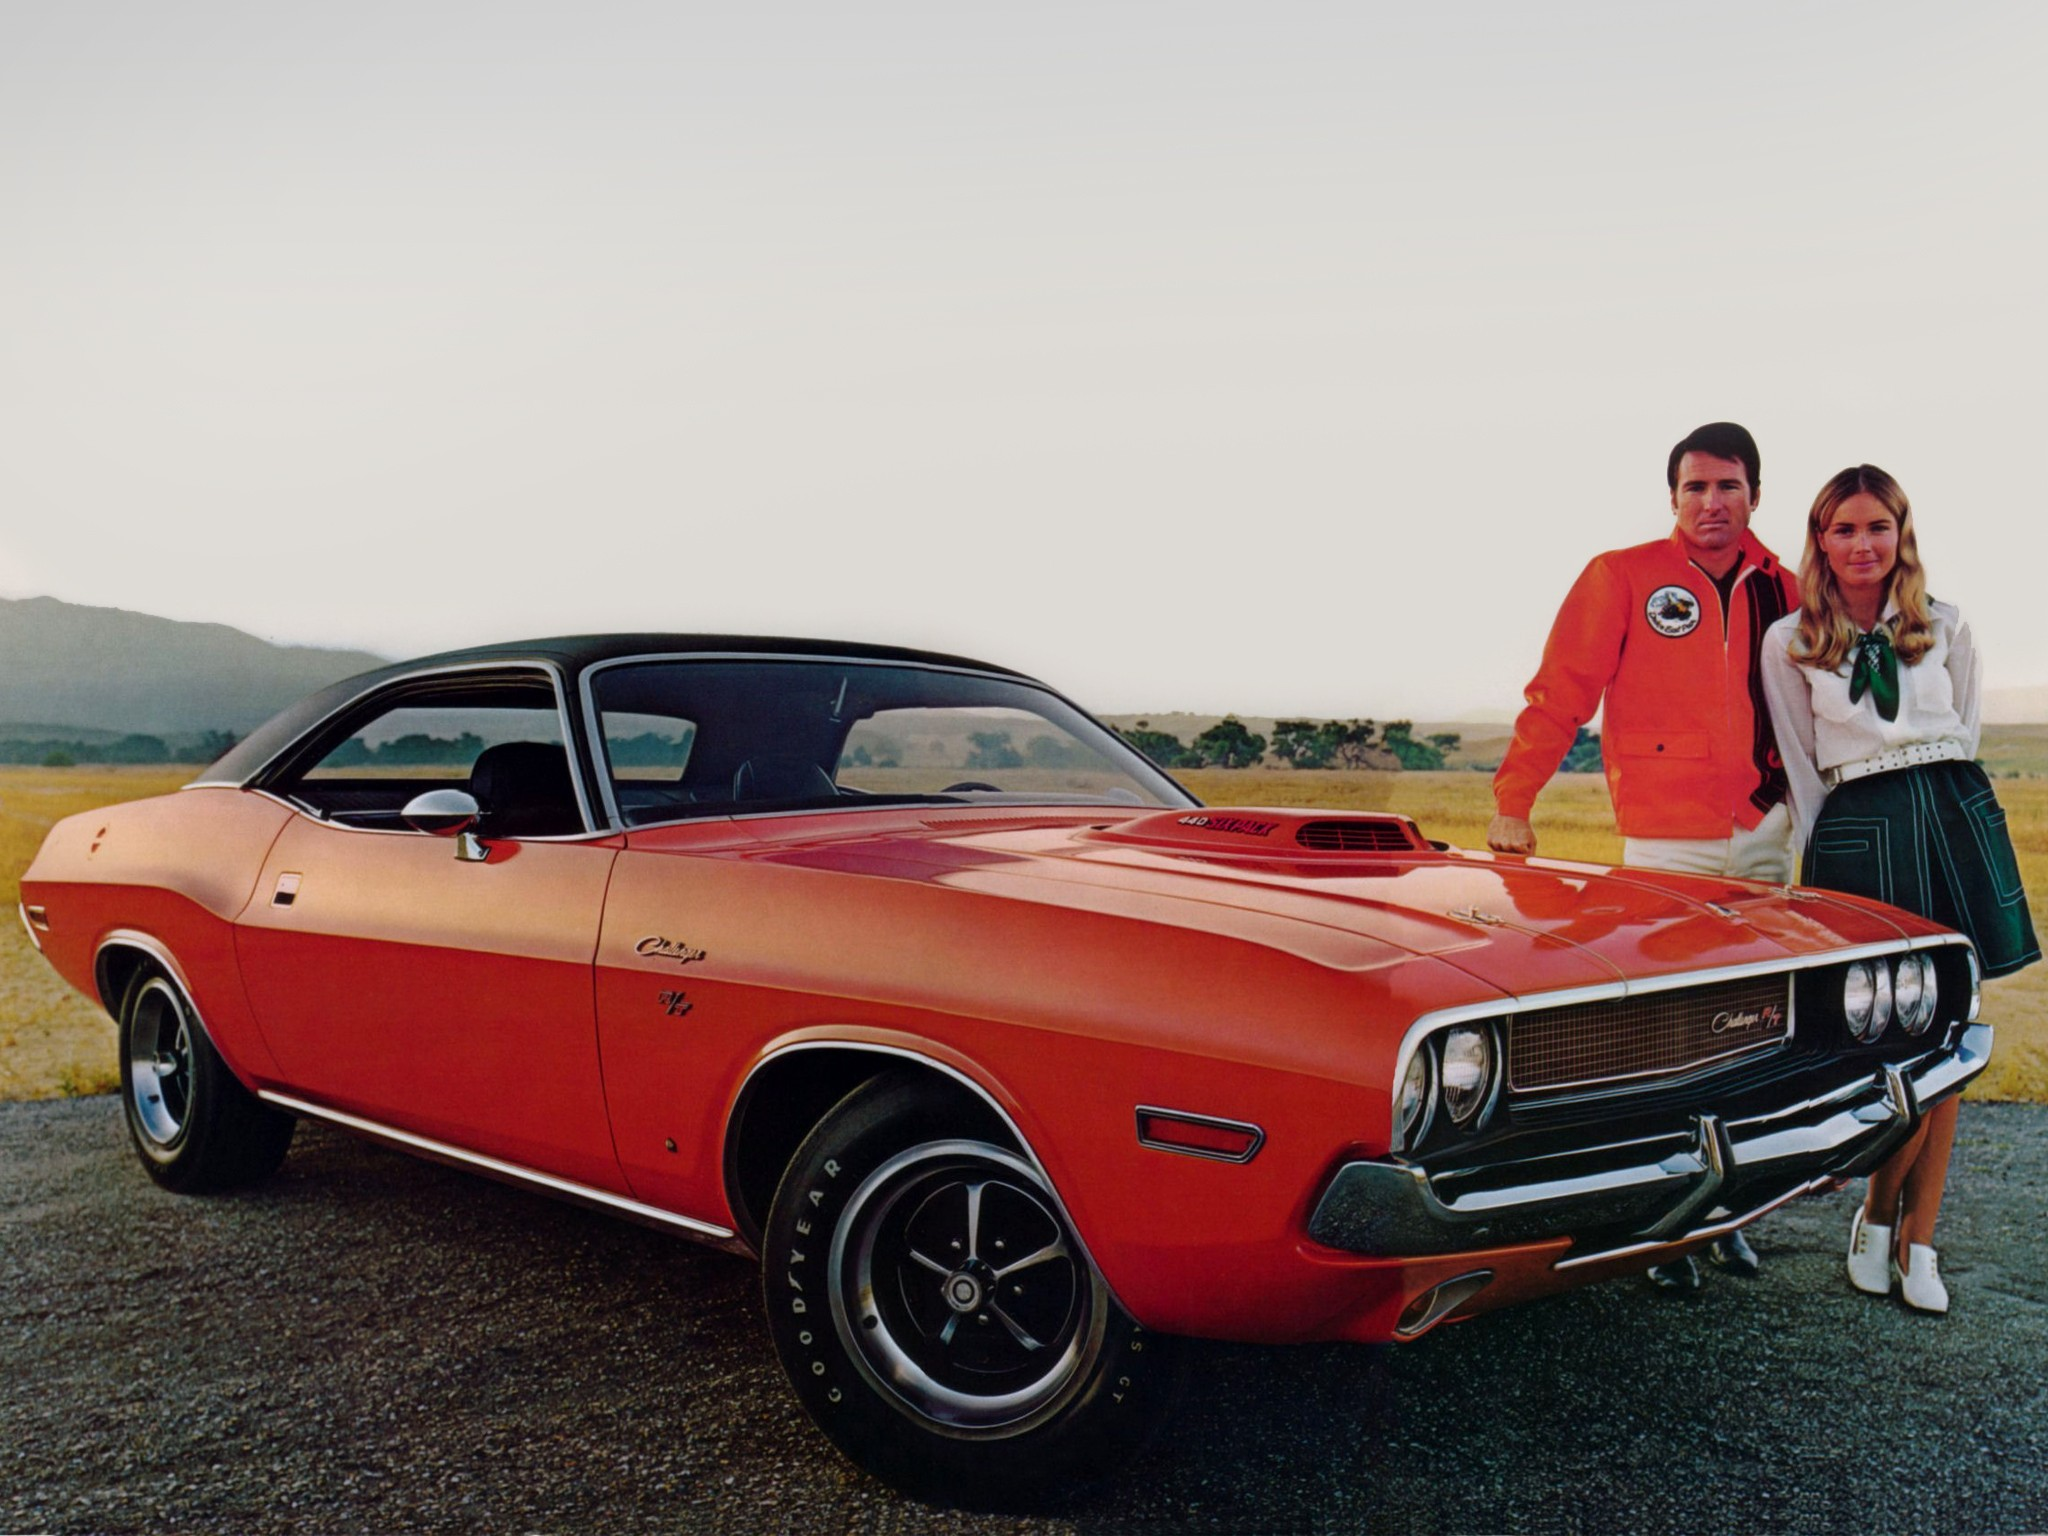 1968 Dodge Charger Wallpaper Cars Dodge Challenger Specs Amp Photos 1969 1970 1971 1972